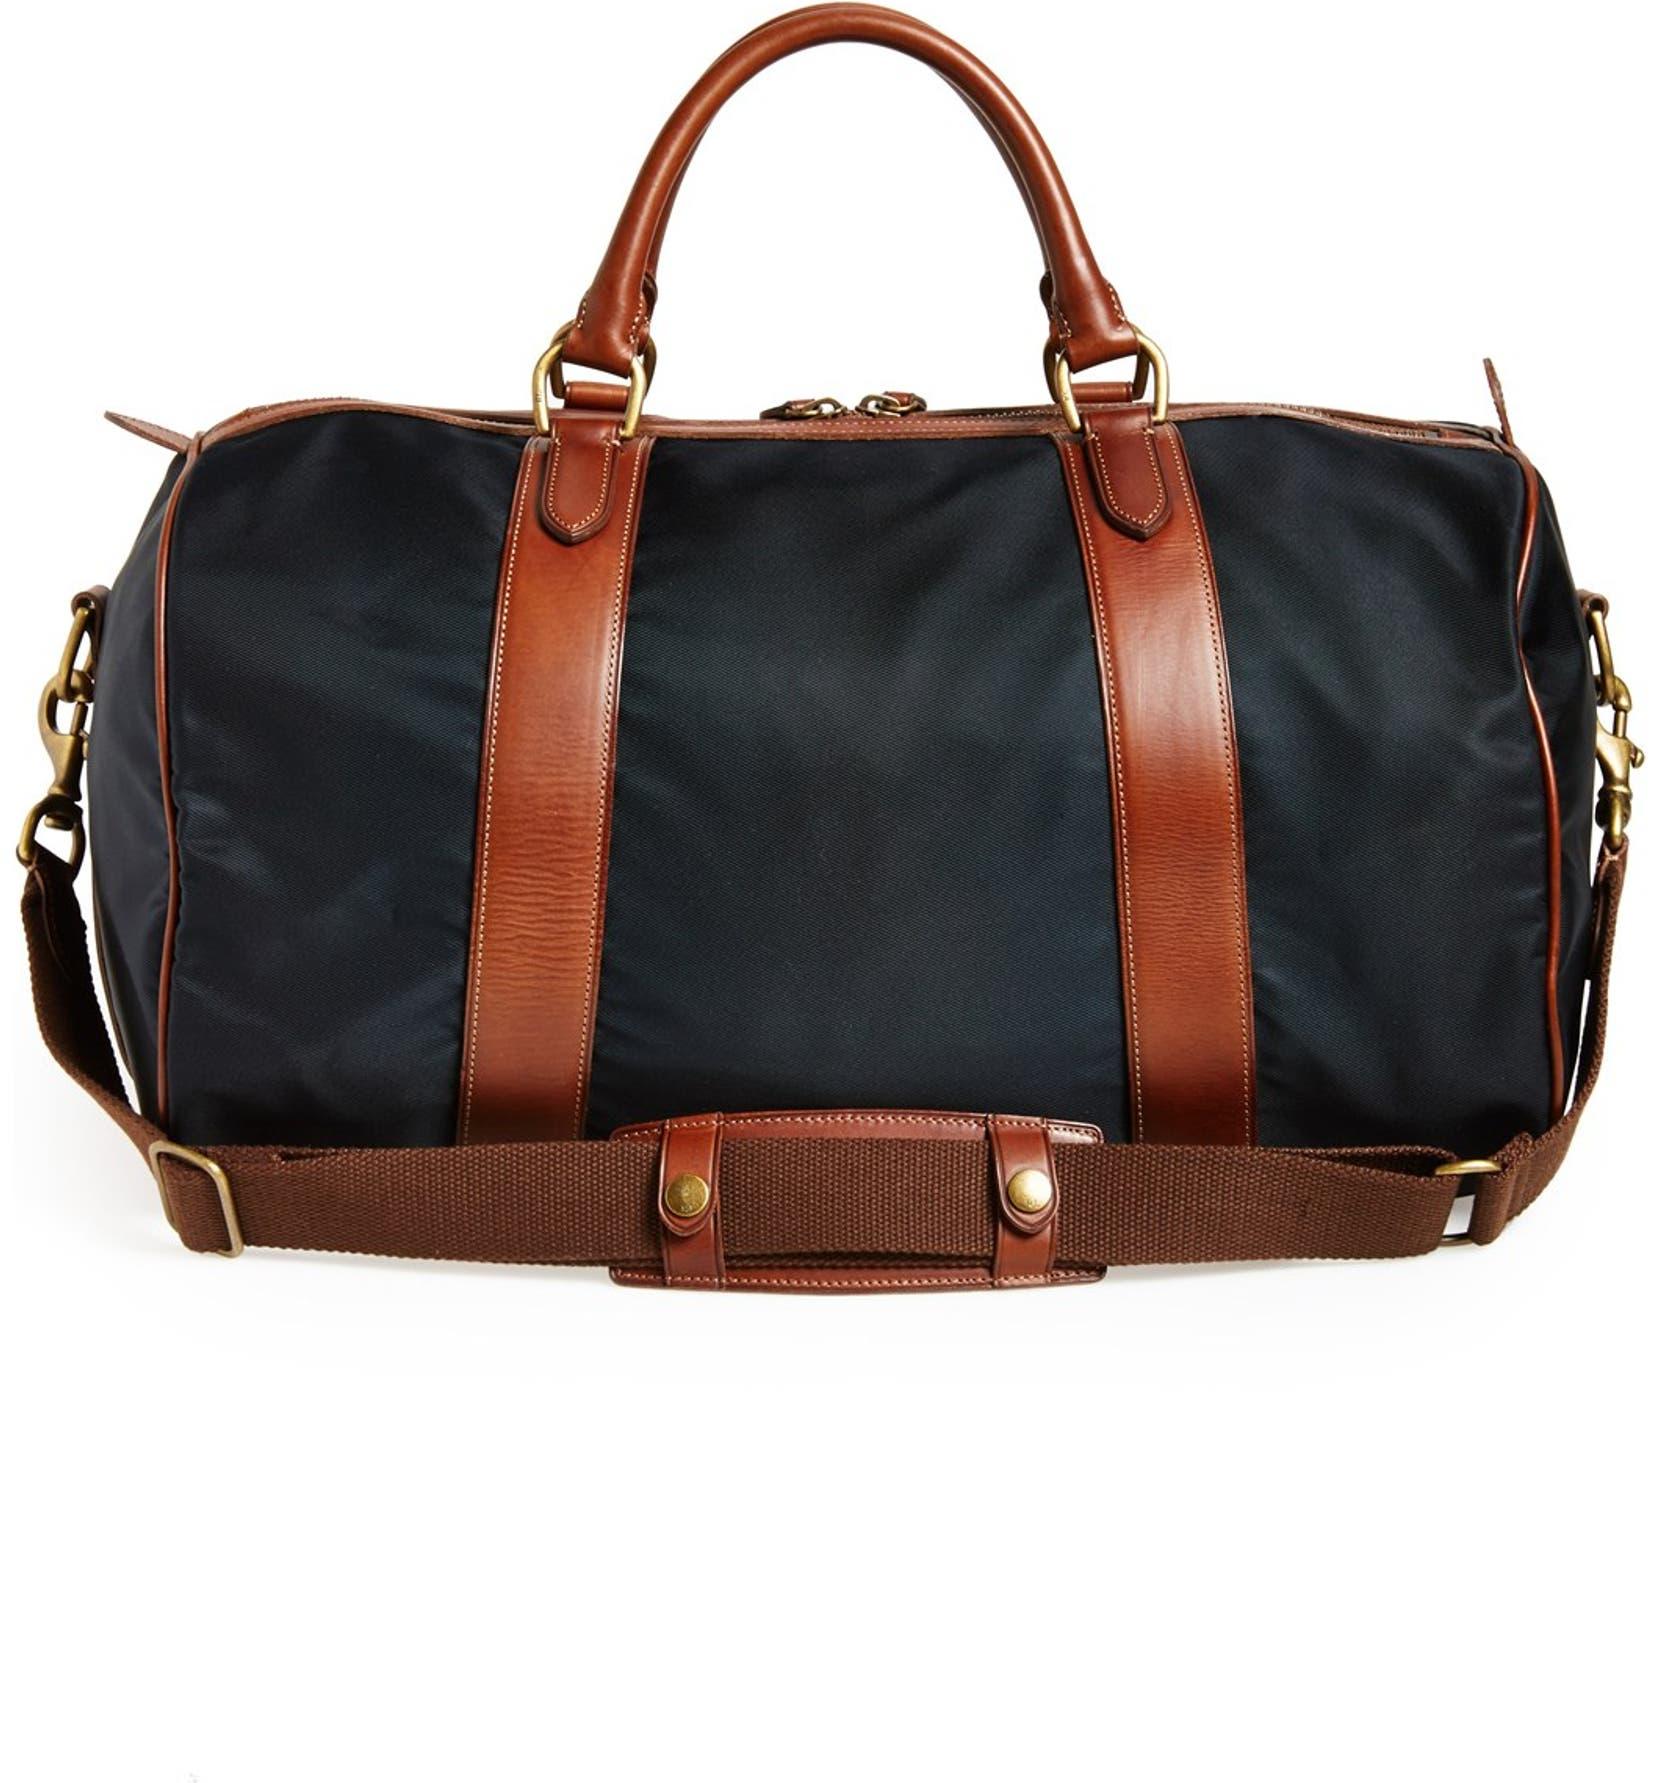 7d0fc6a08f Polo Ralph Lauren Nylon   Leather Duffel Bag